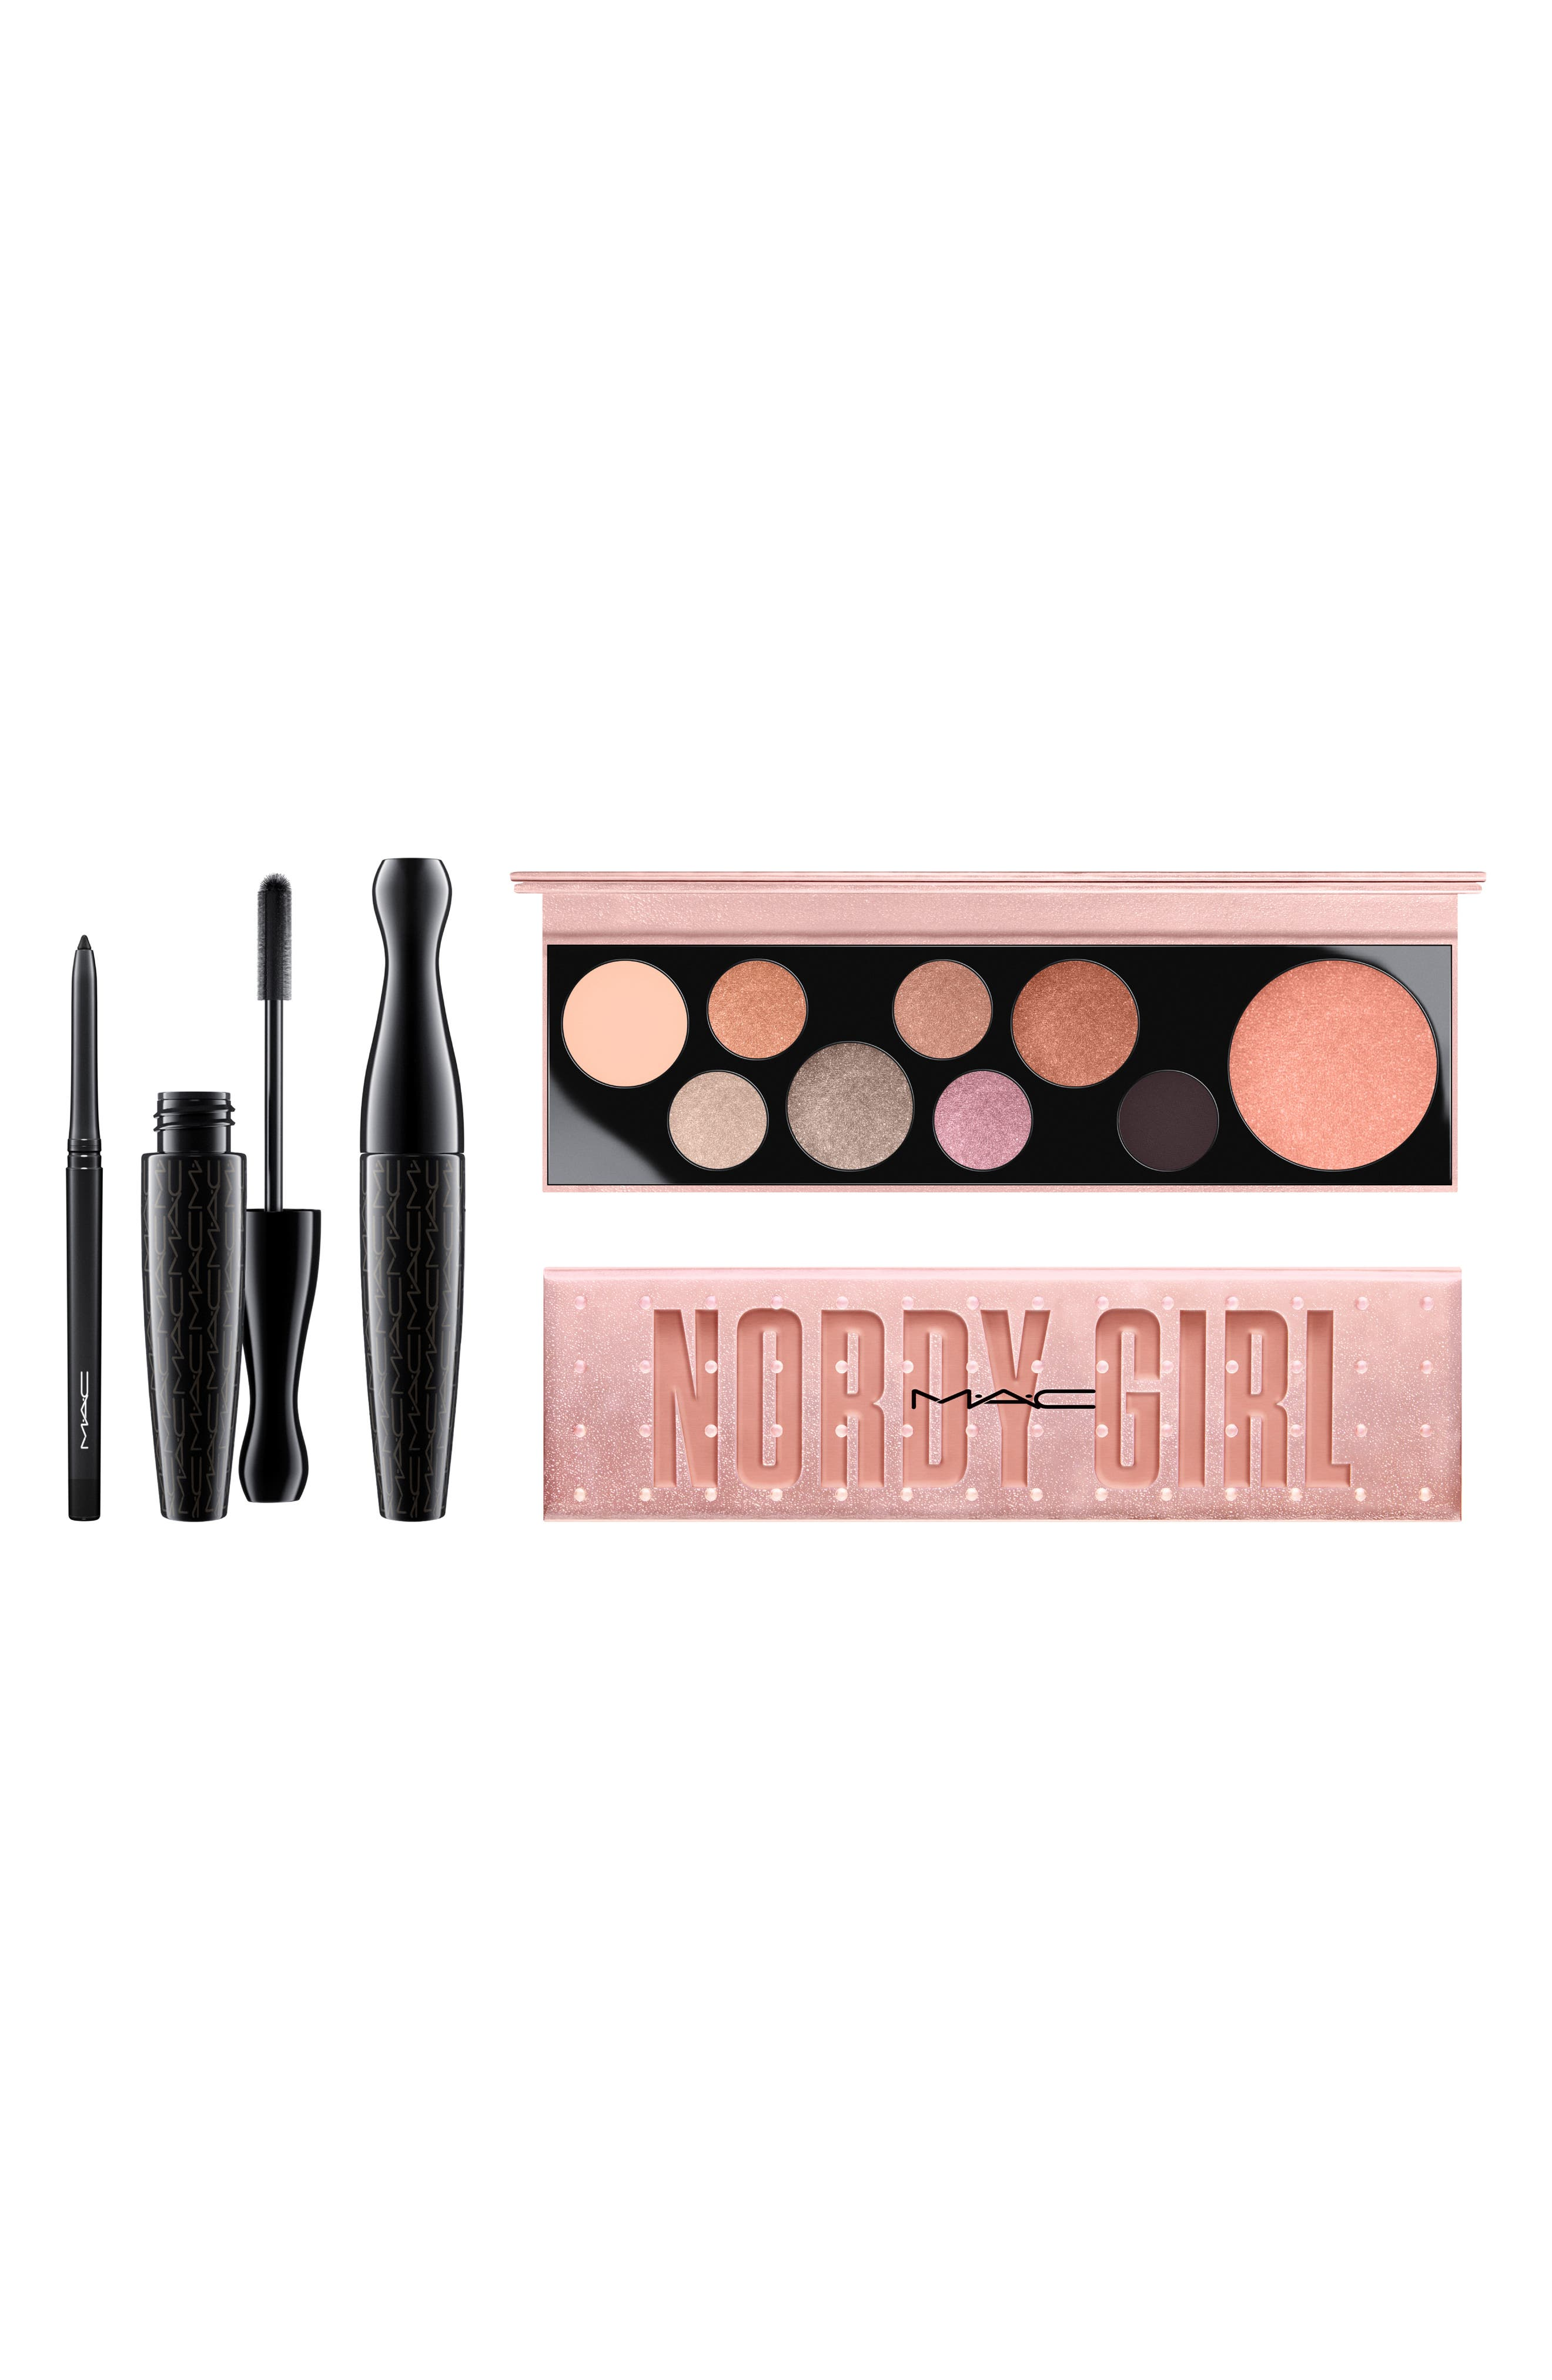 MAC Nordy Girl Metallic Face & Eye Set,                             Main thumbnail 1, color,                             000